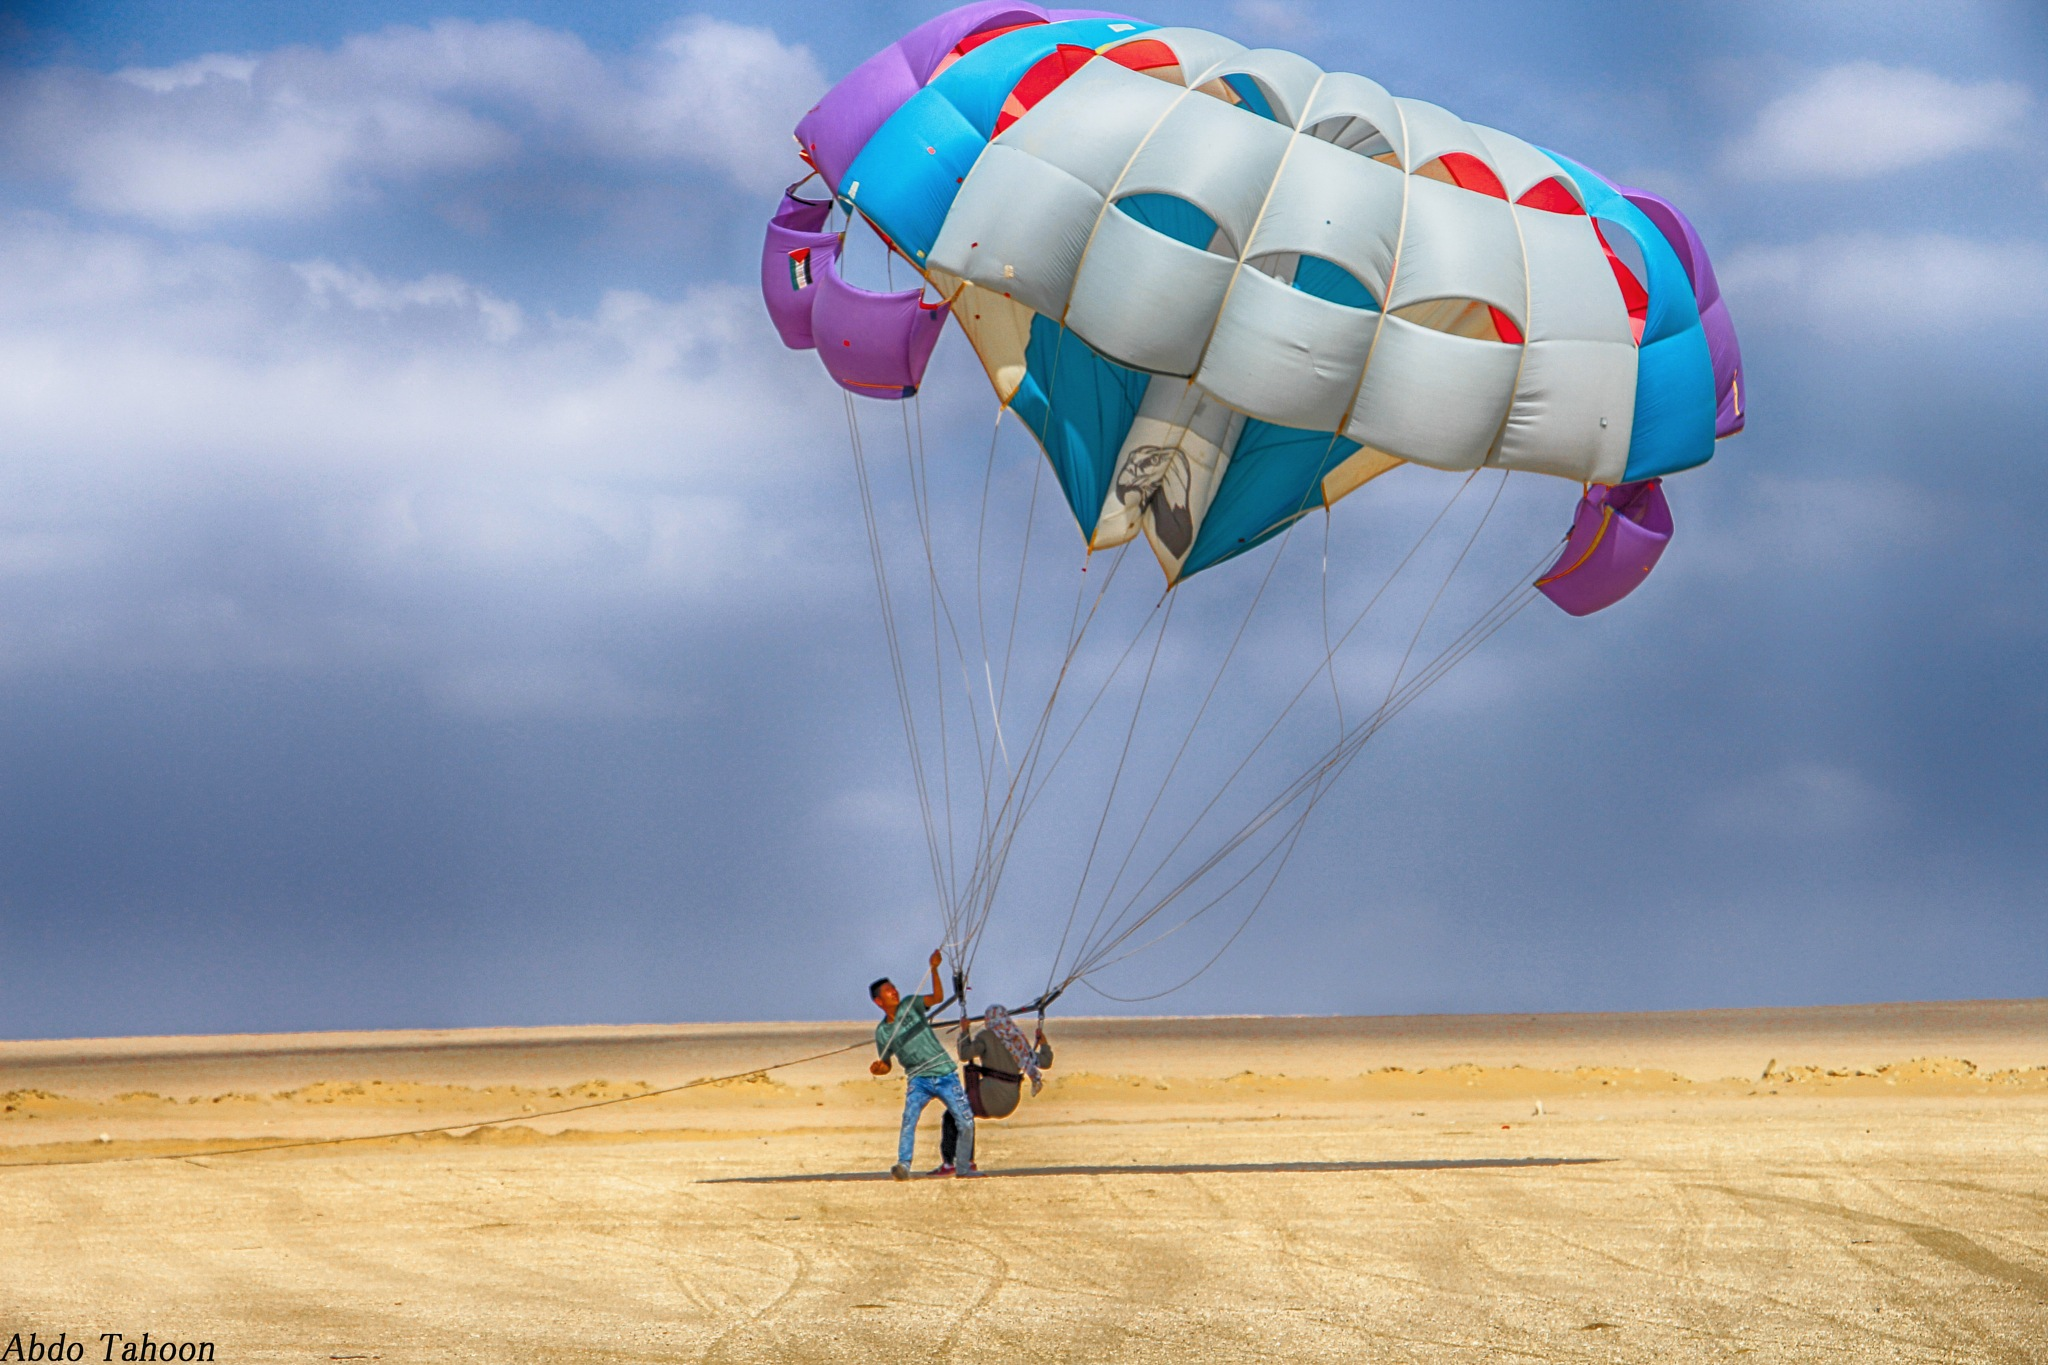 Parachute by Abdo Tahoon